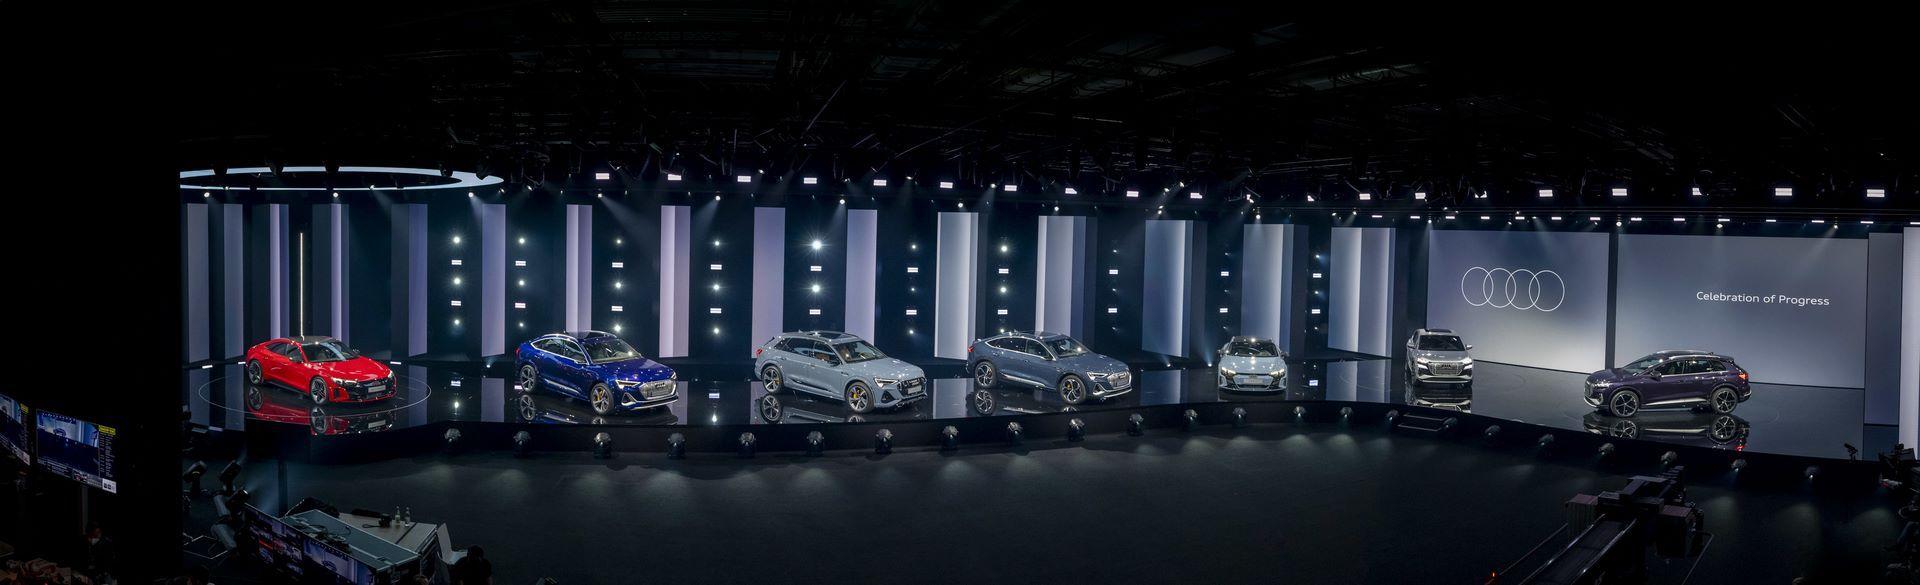 Audi-Q4-e-tron-and-Q4-e-tron-Sportback-20